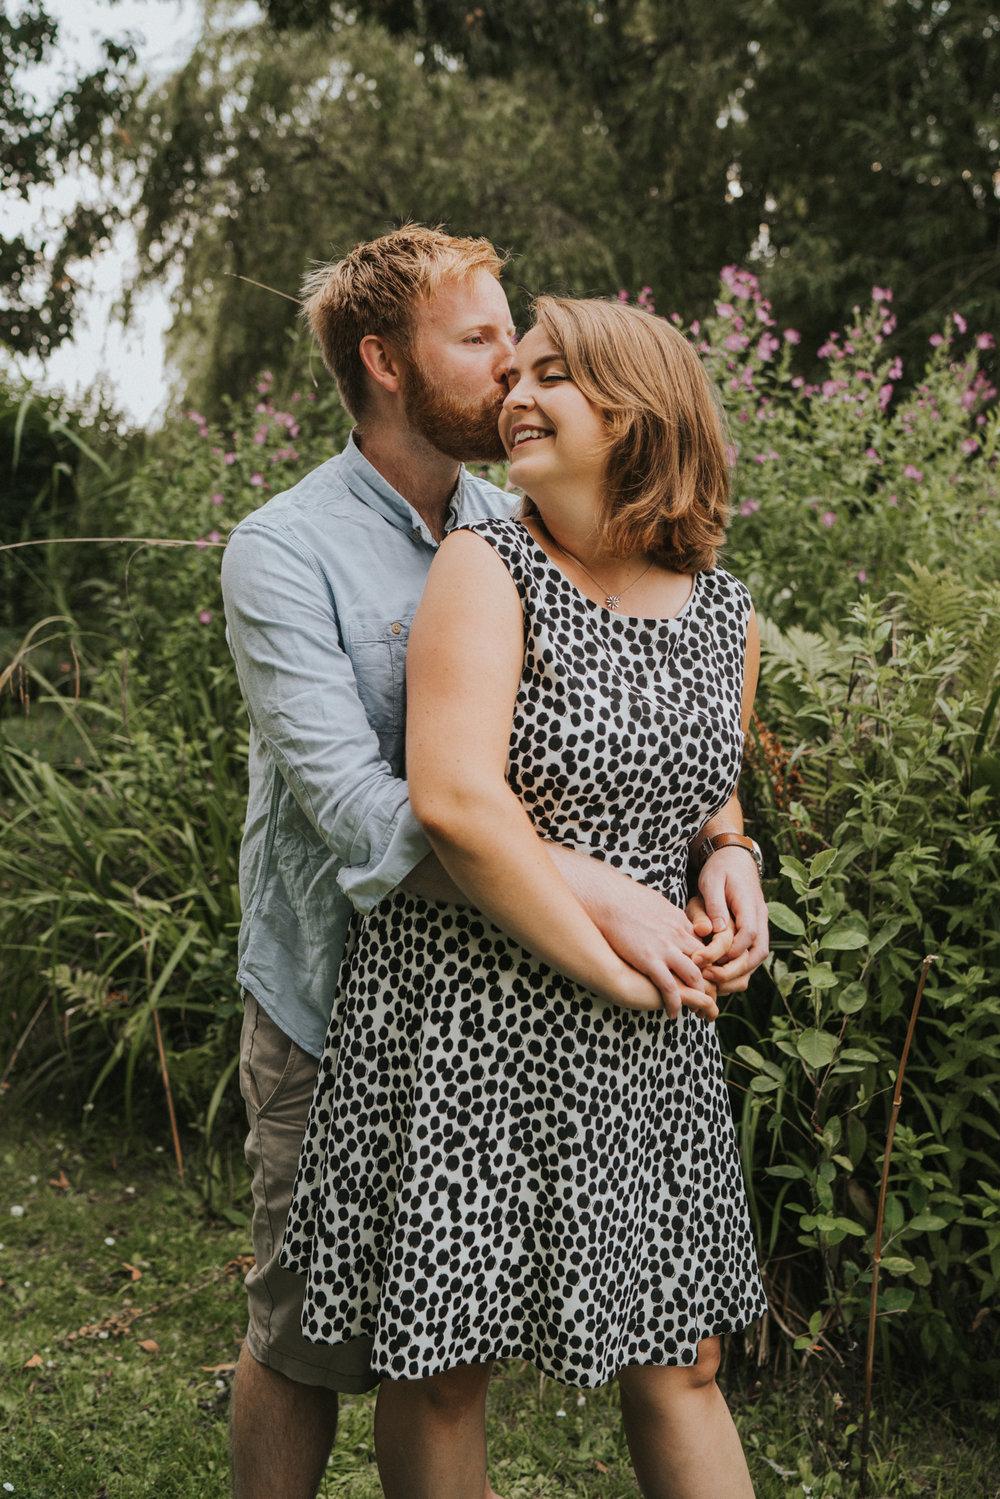 Parkers-Extended-Family-Session-Grace-Elizabeth-Alternative-Wedding-Lifestyle-Photographer-Colchester-Essex-Norfolk-Suffolk-Devon (35 of 62).jpg